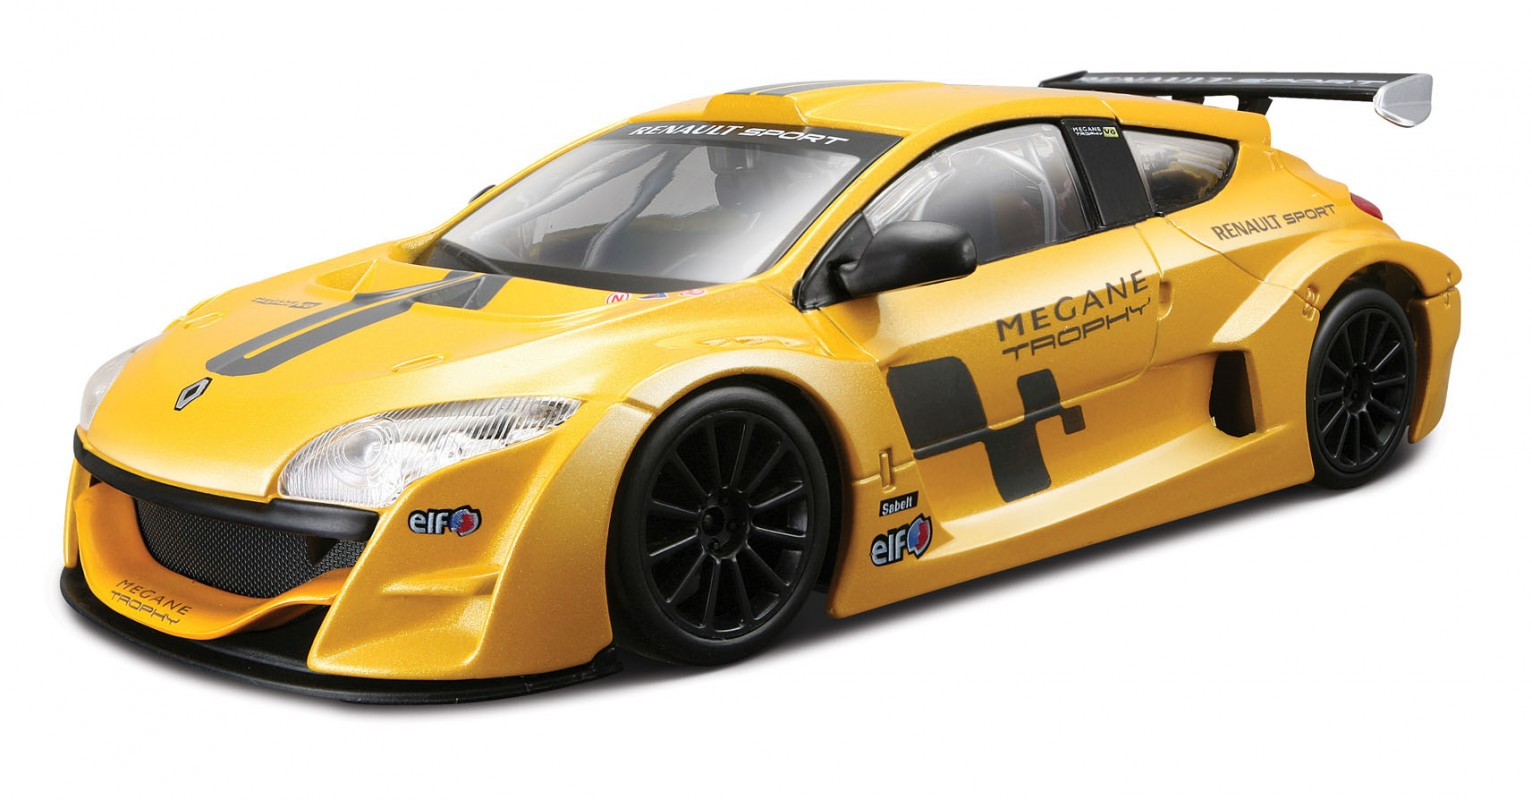 Bburago - Renault Mégane Trophy KIT 1:24 Close Box